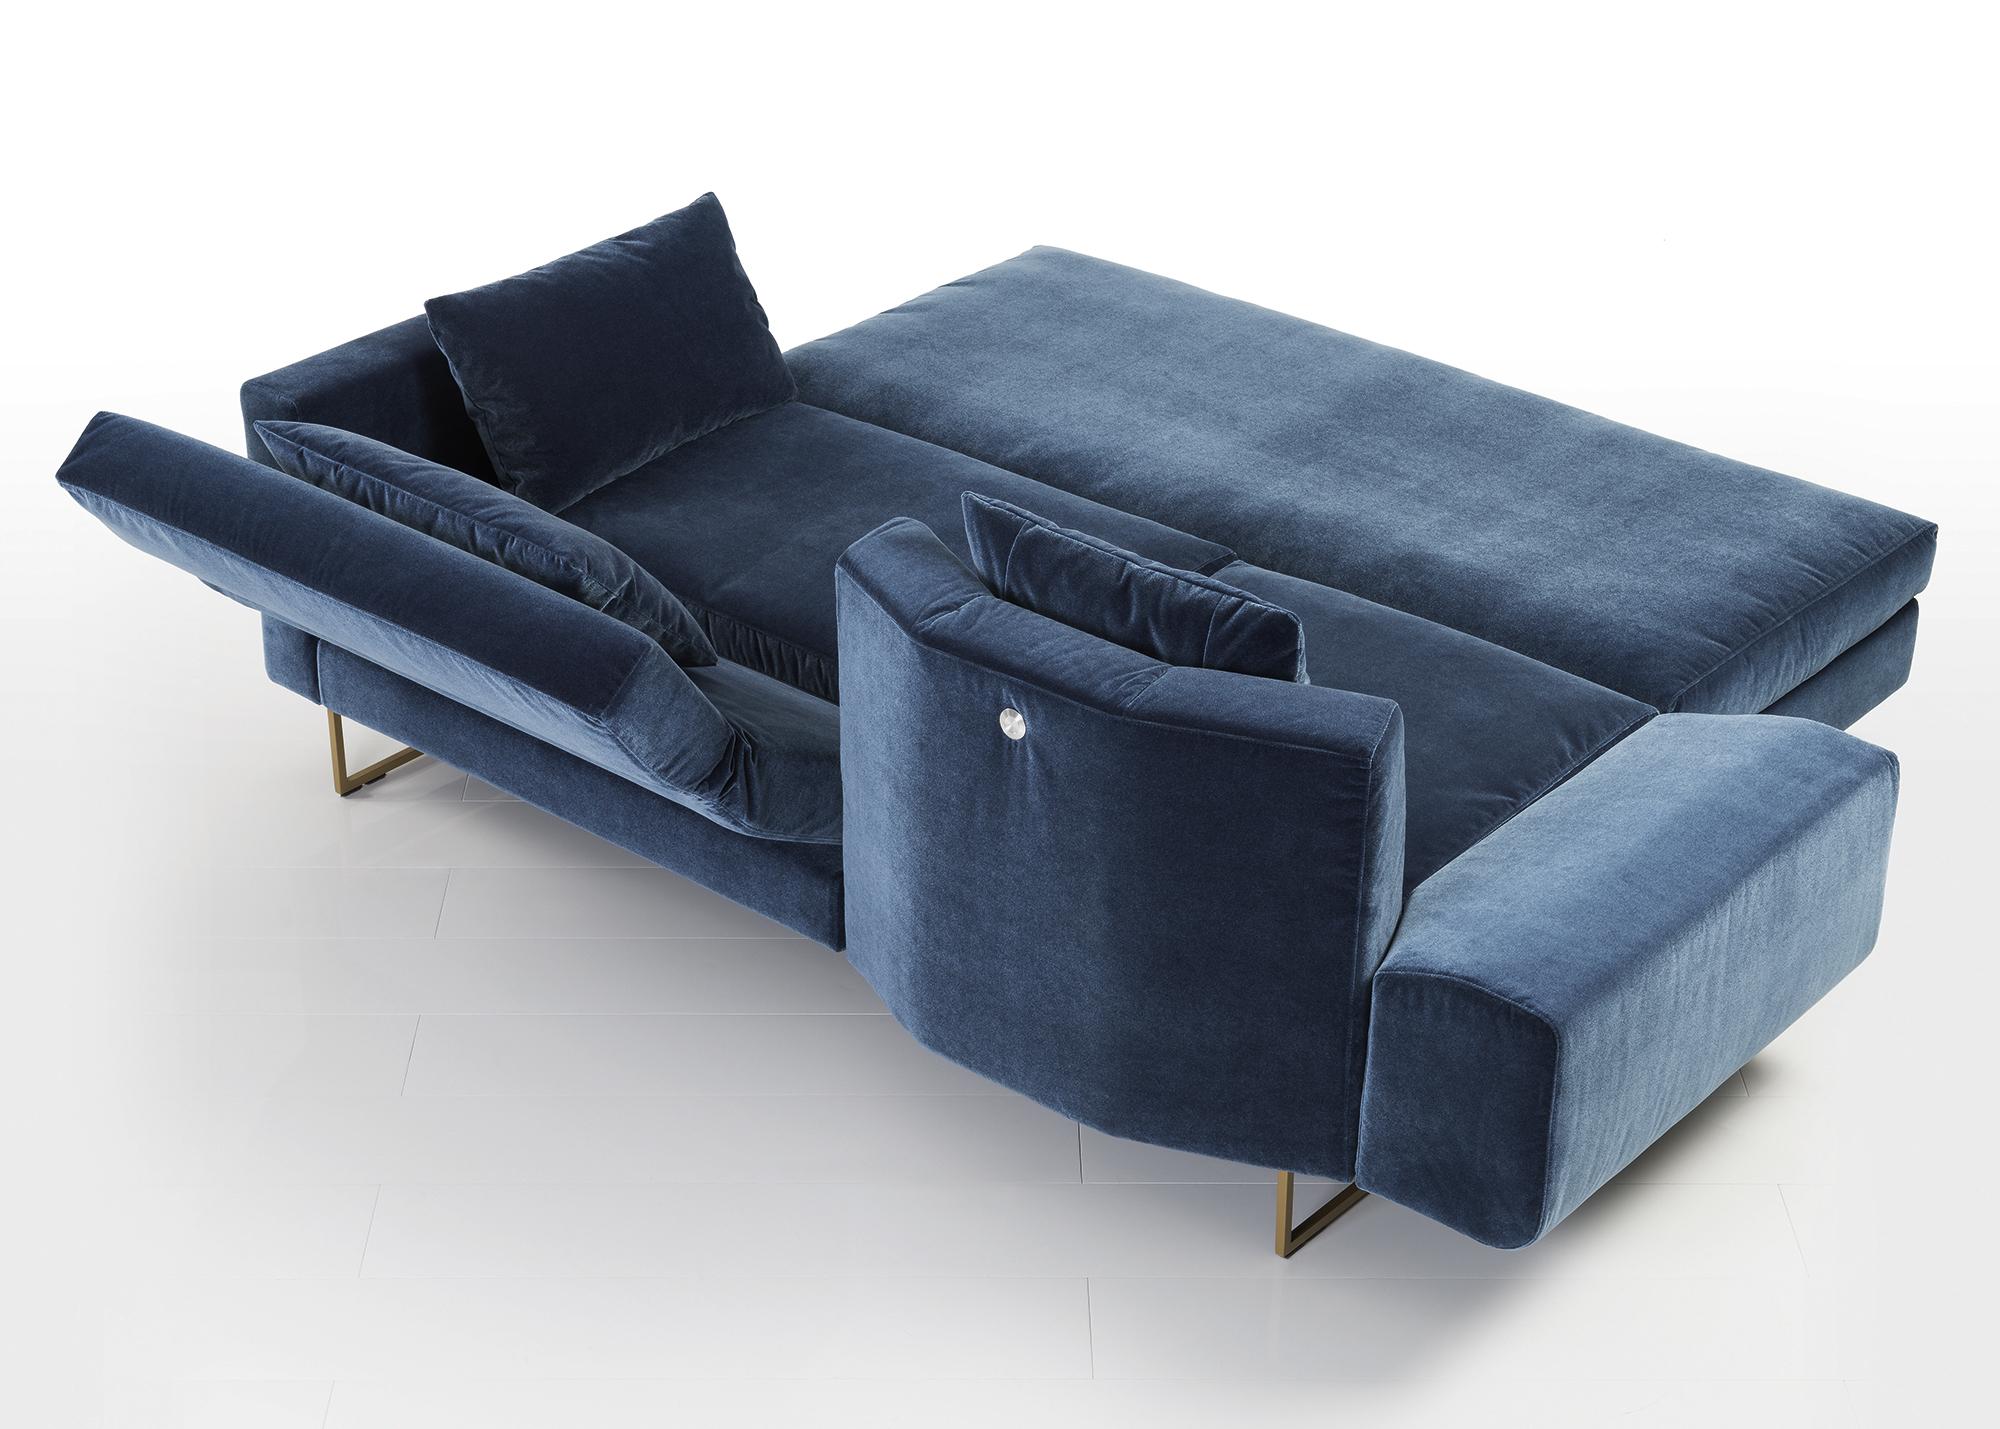 ber hmt polstermobel bruhl ideen die kinderzimmer design ideen. Black Bedroom Furniture Sets. Home Design Ideas